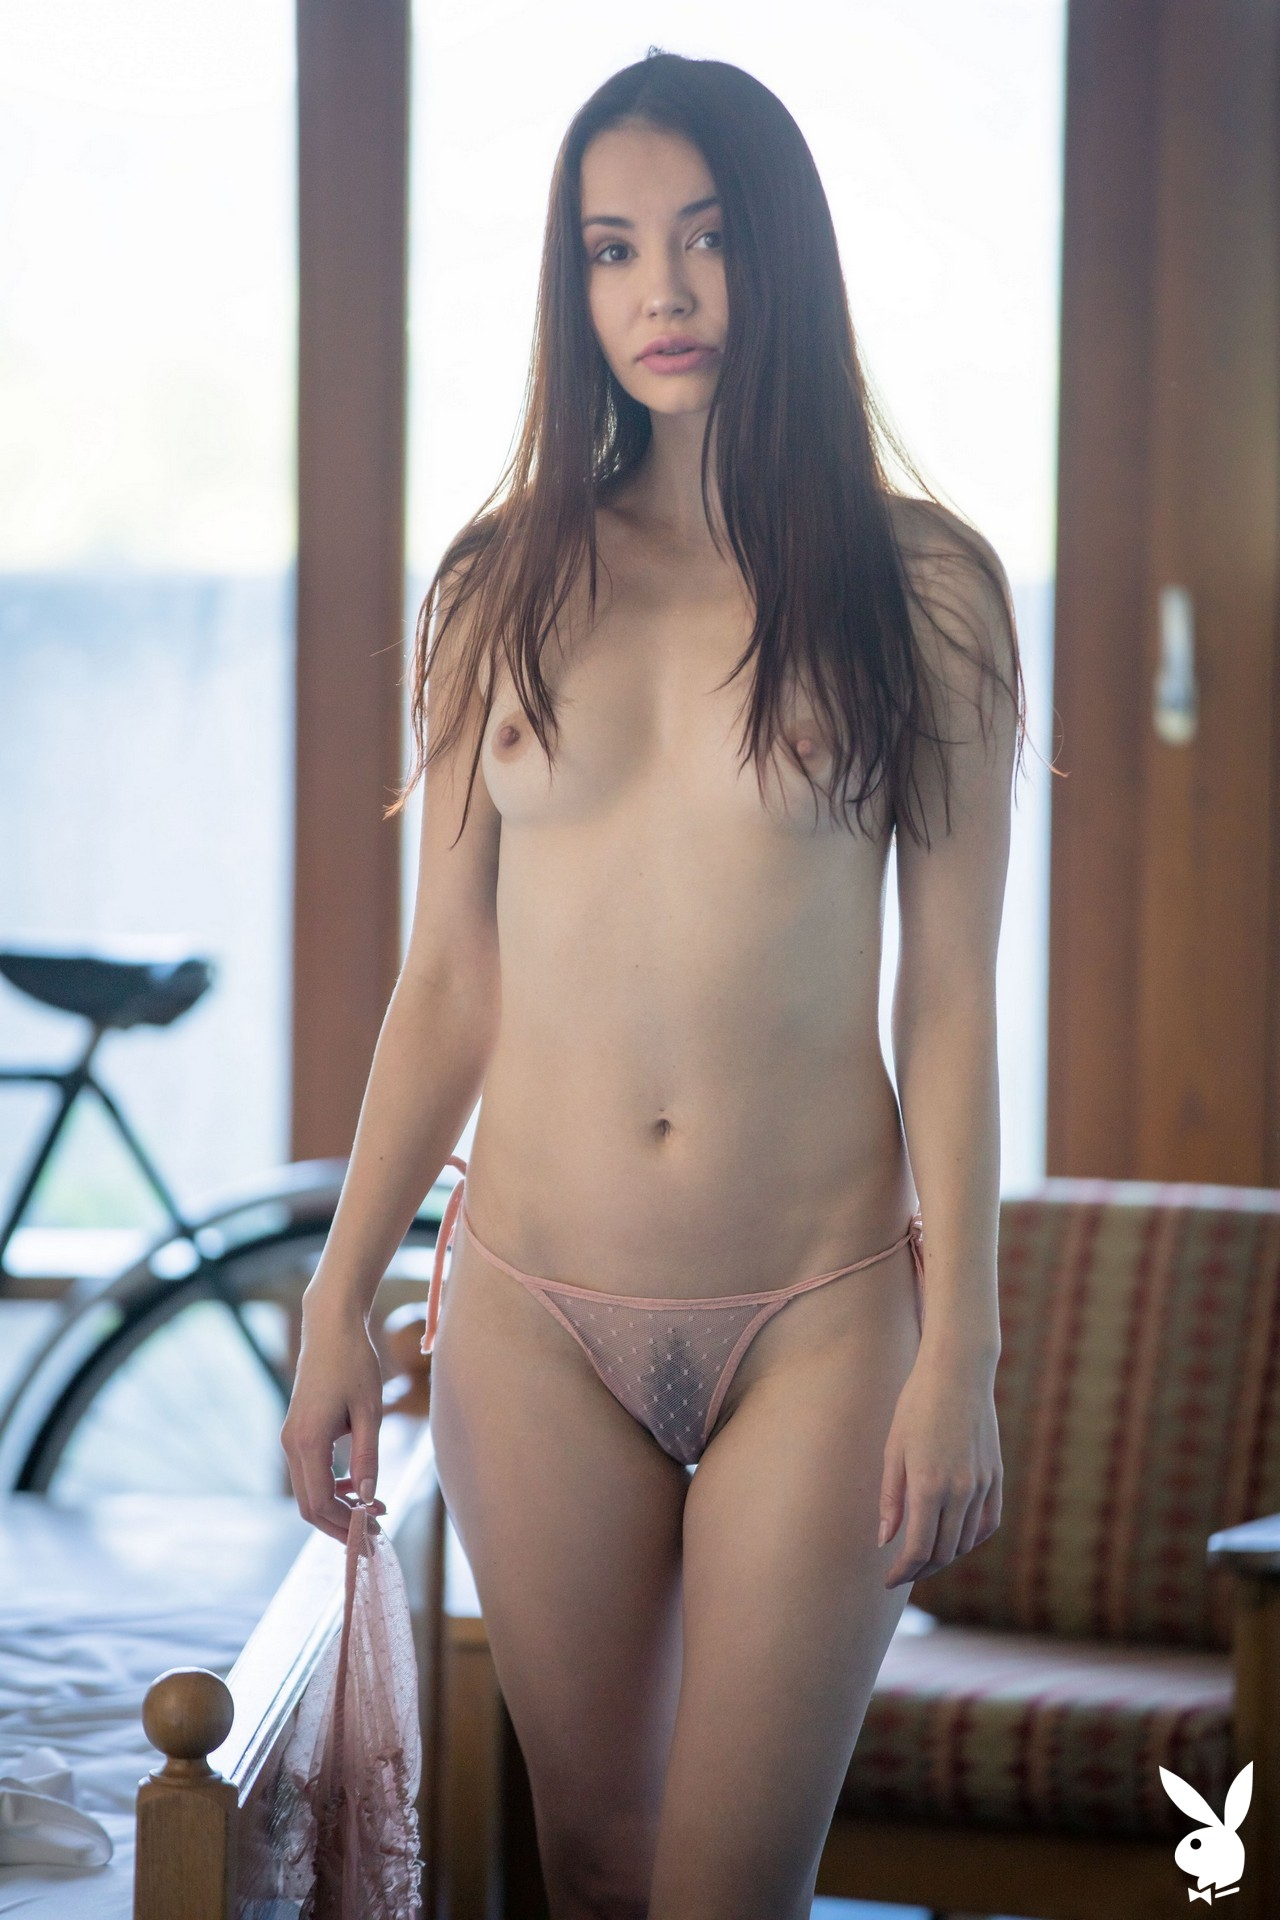 Elilith Noir In Tucked Away Playboy Plus (12)